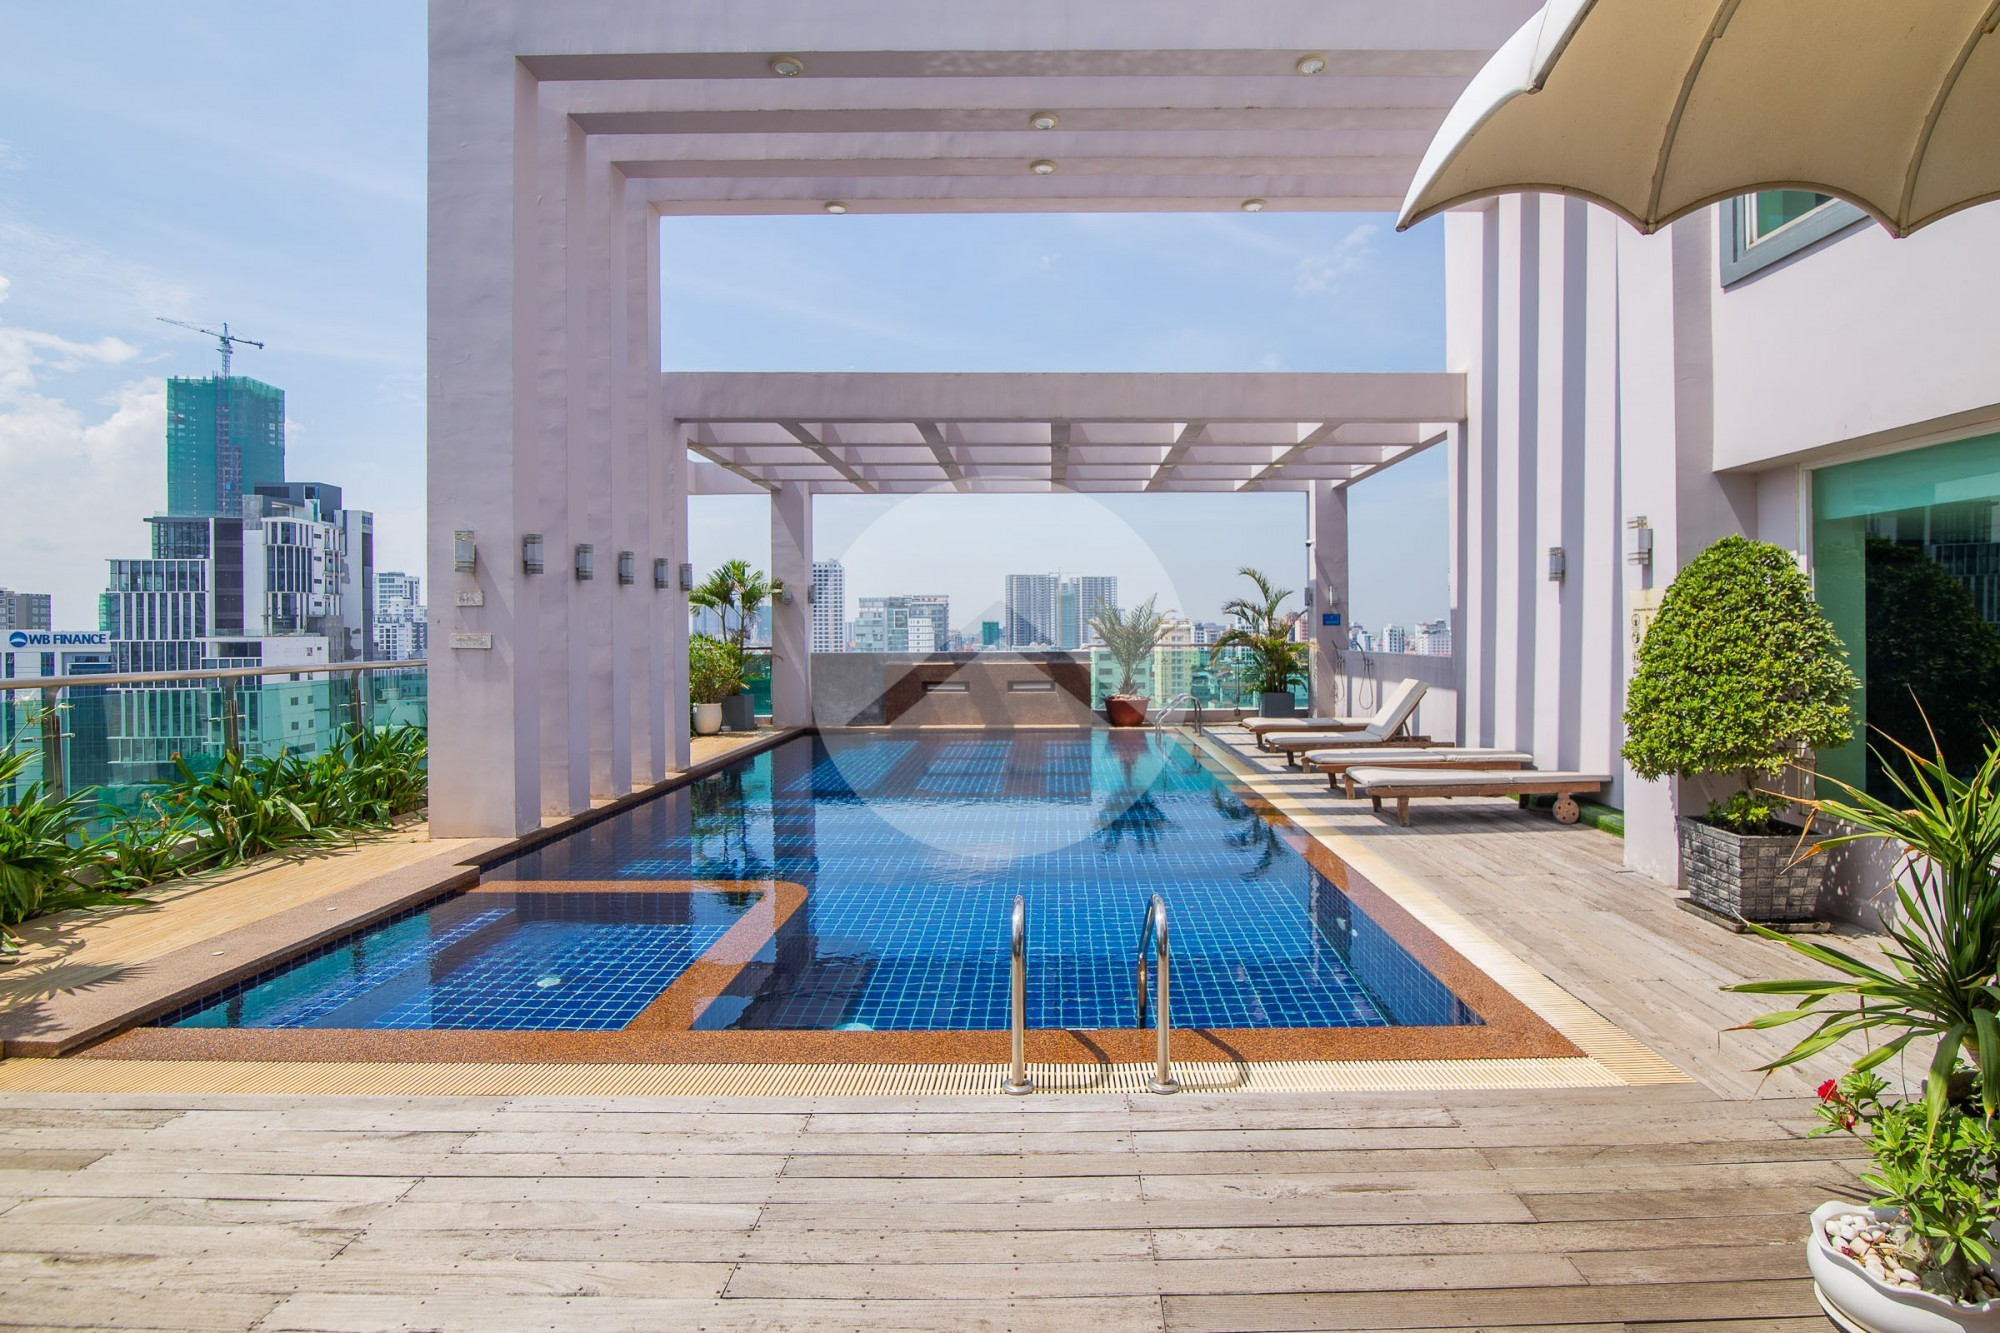 2 Bedroom Serviced Apartment For Rent - BKK3, Phnom Penh